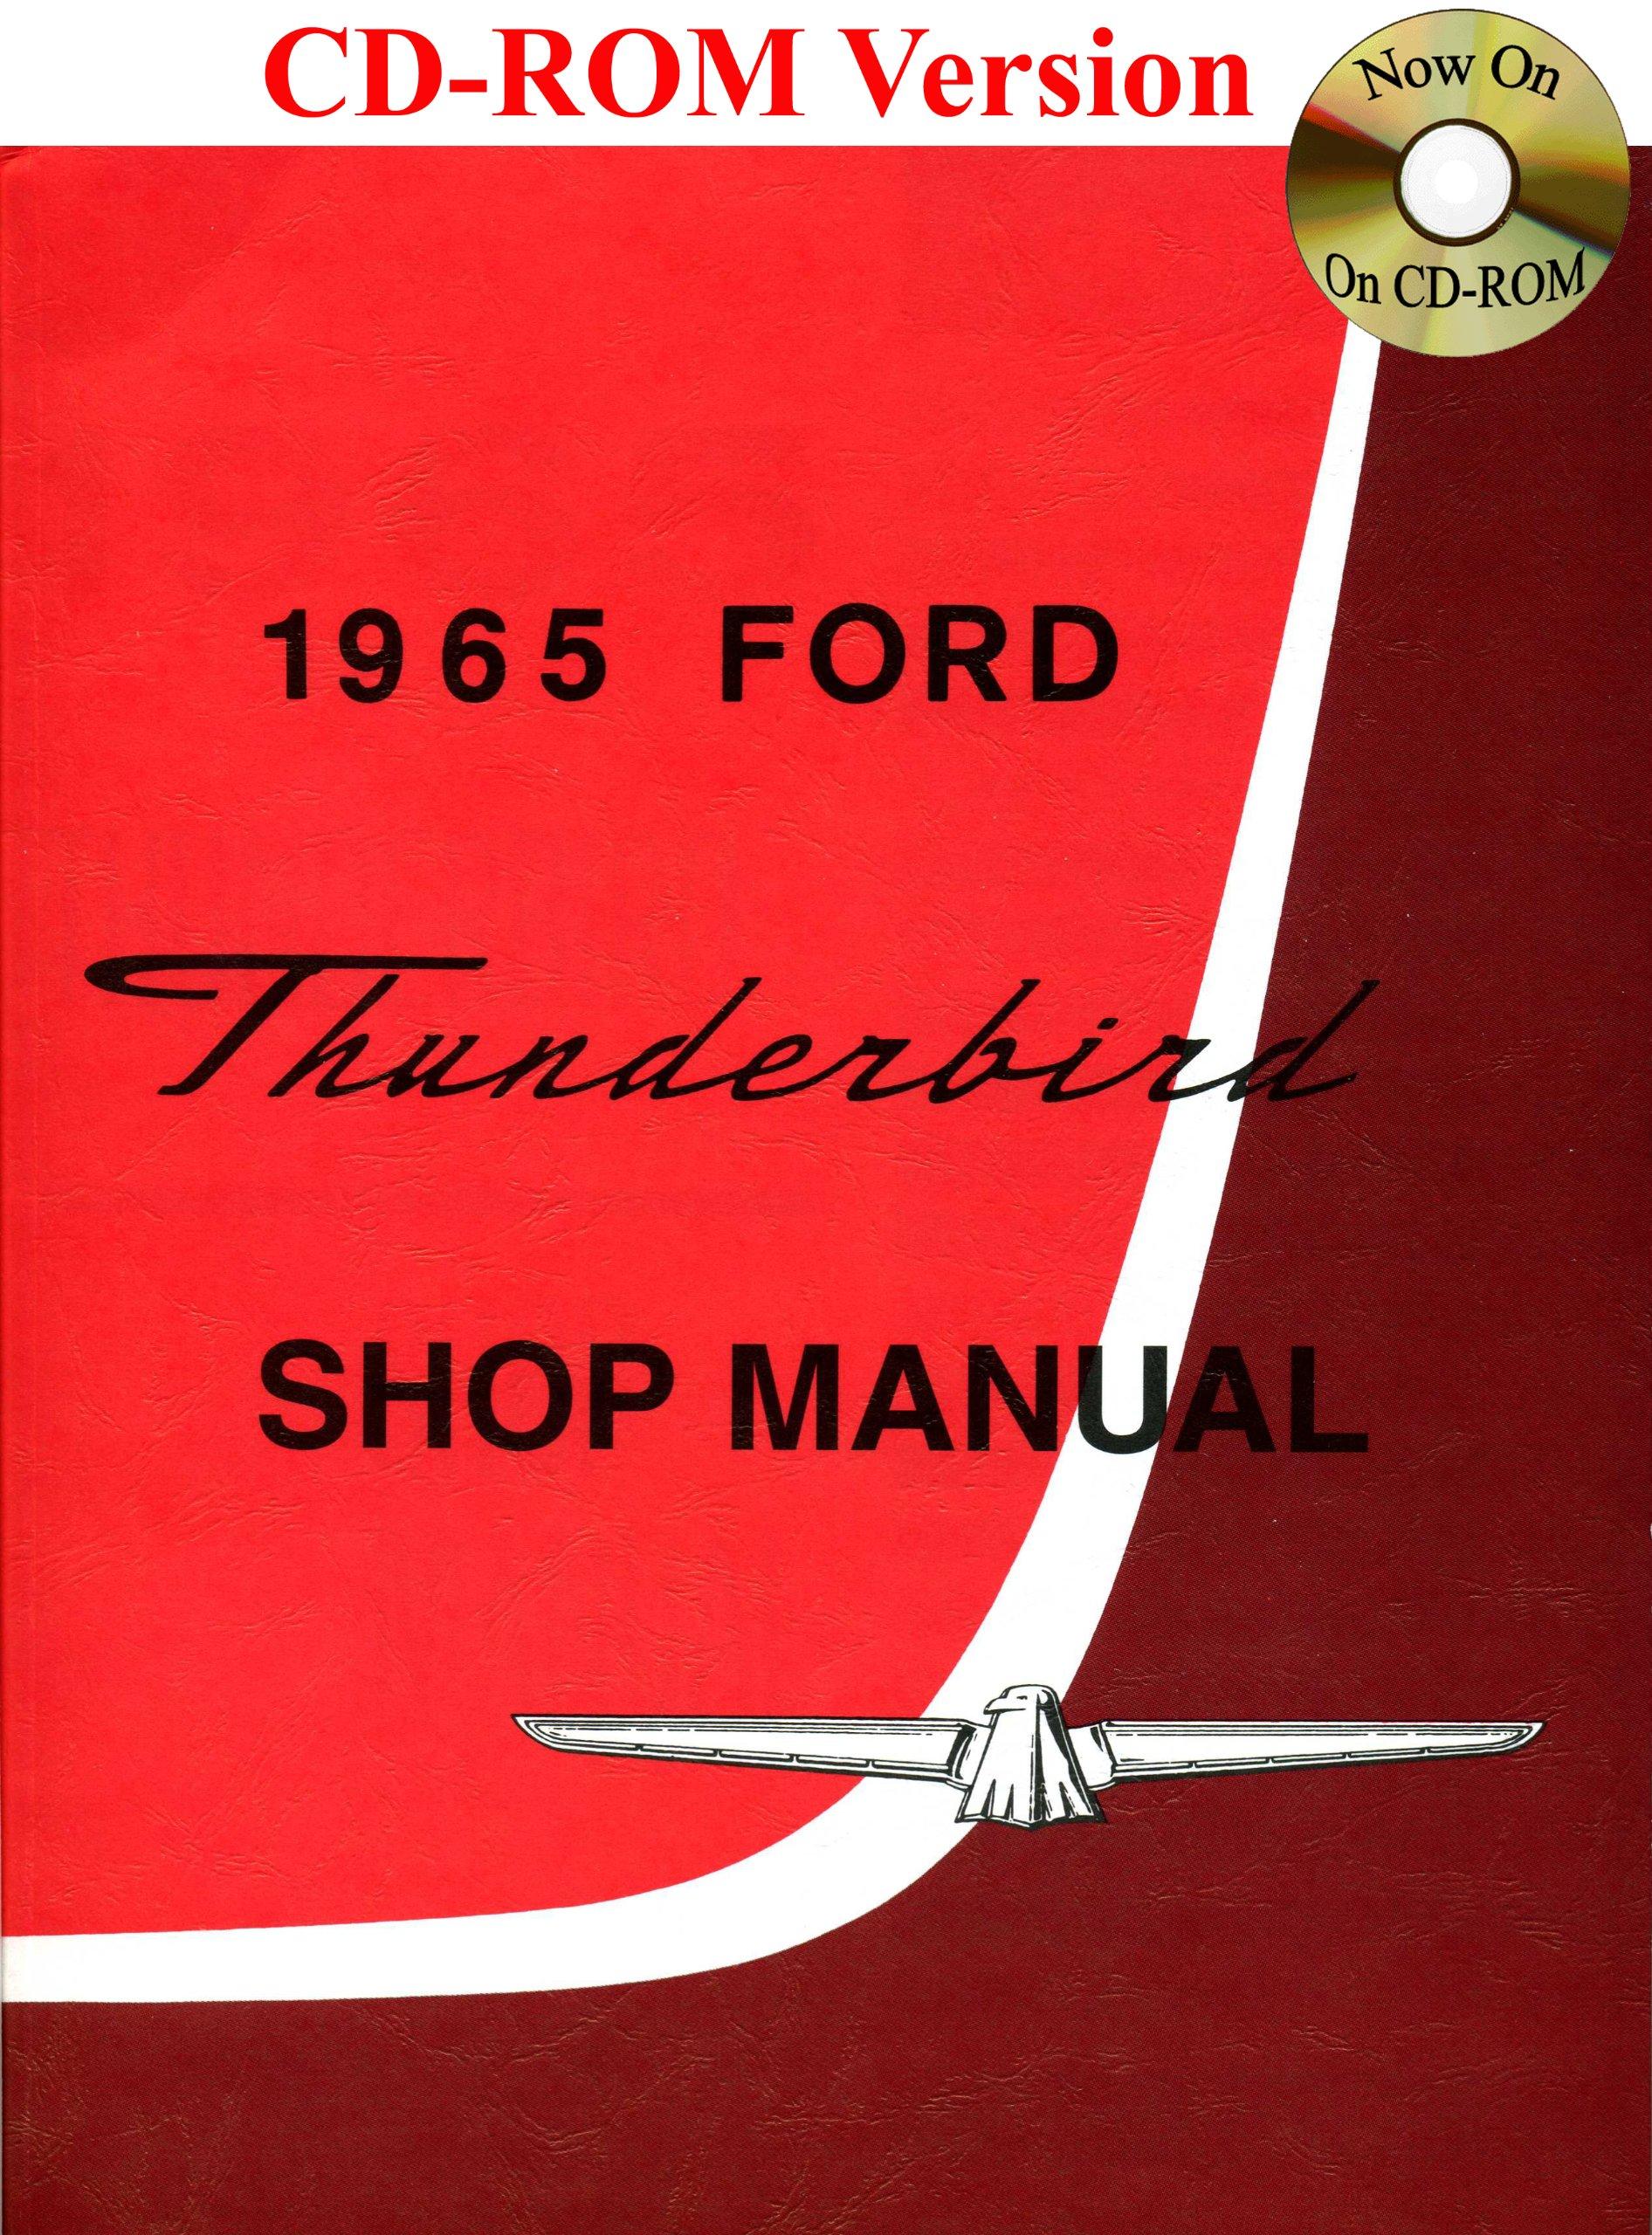 1965 Ford Thunderbird Shop Manual: Ford Motor Company, David E. LeBlanc:  9781603710152: Amazon.com: Books